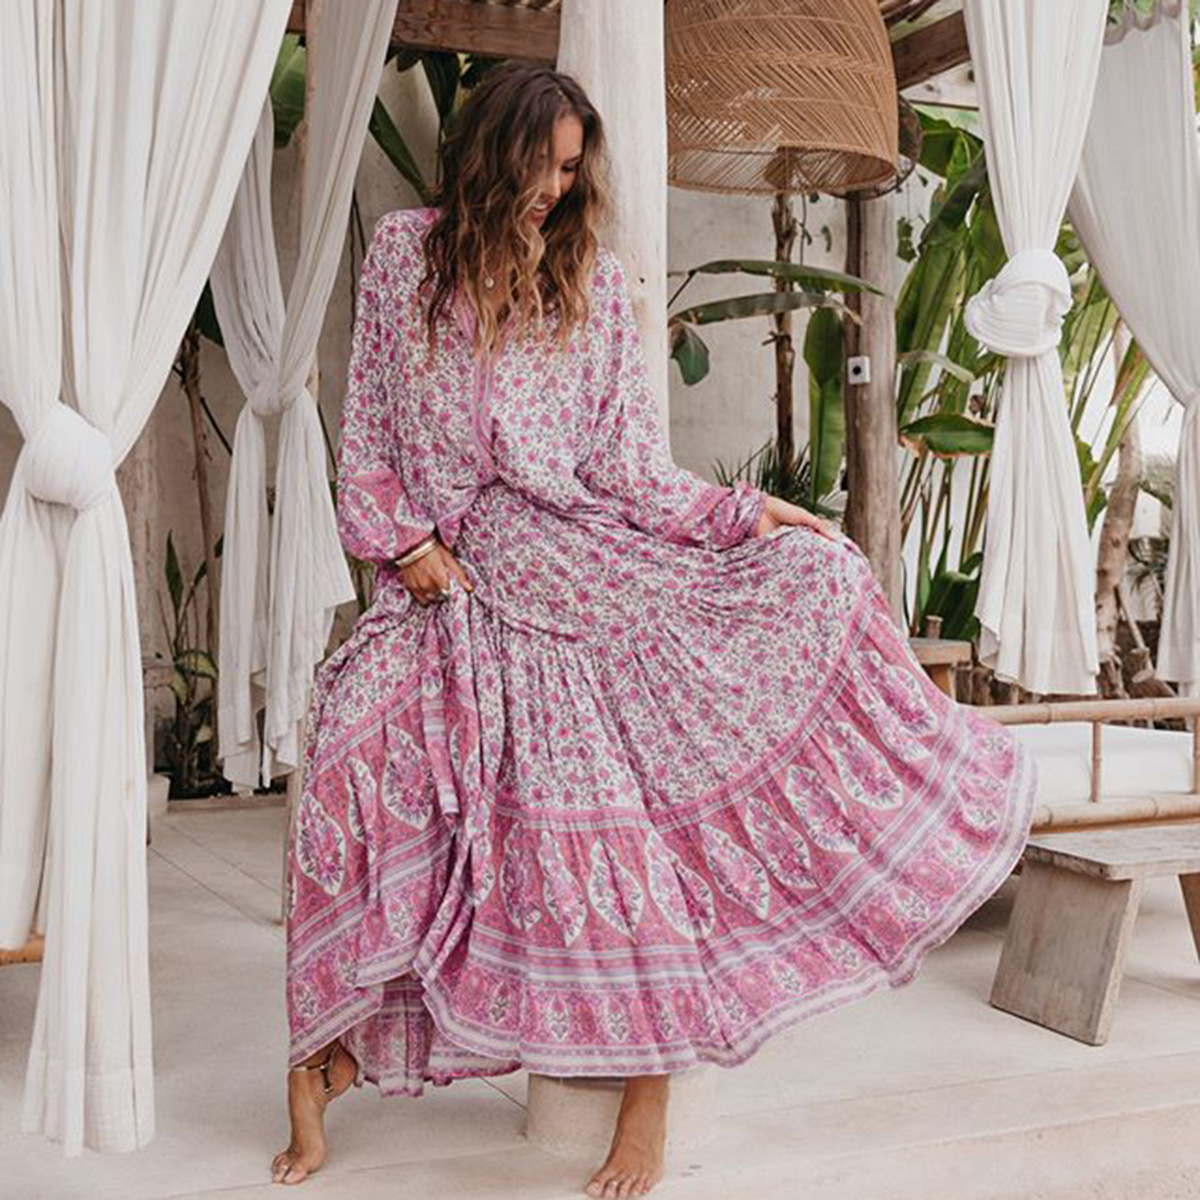 Jasmine Print Floral Bohemian Top Skirt Sets Women High Waist Skirts Loose Blouses Suit Set Ladies Gypsy Hippie Sexy 2 Piece Set